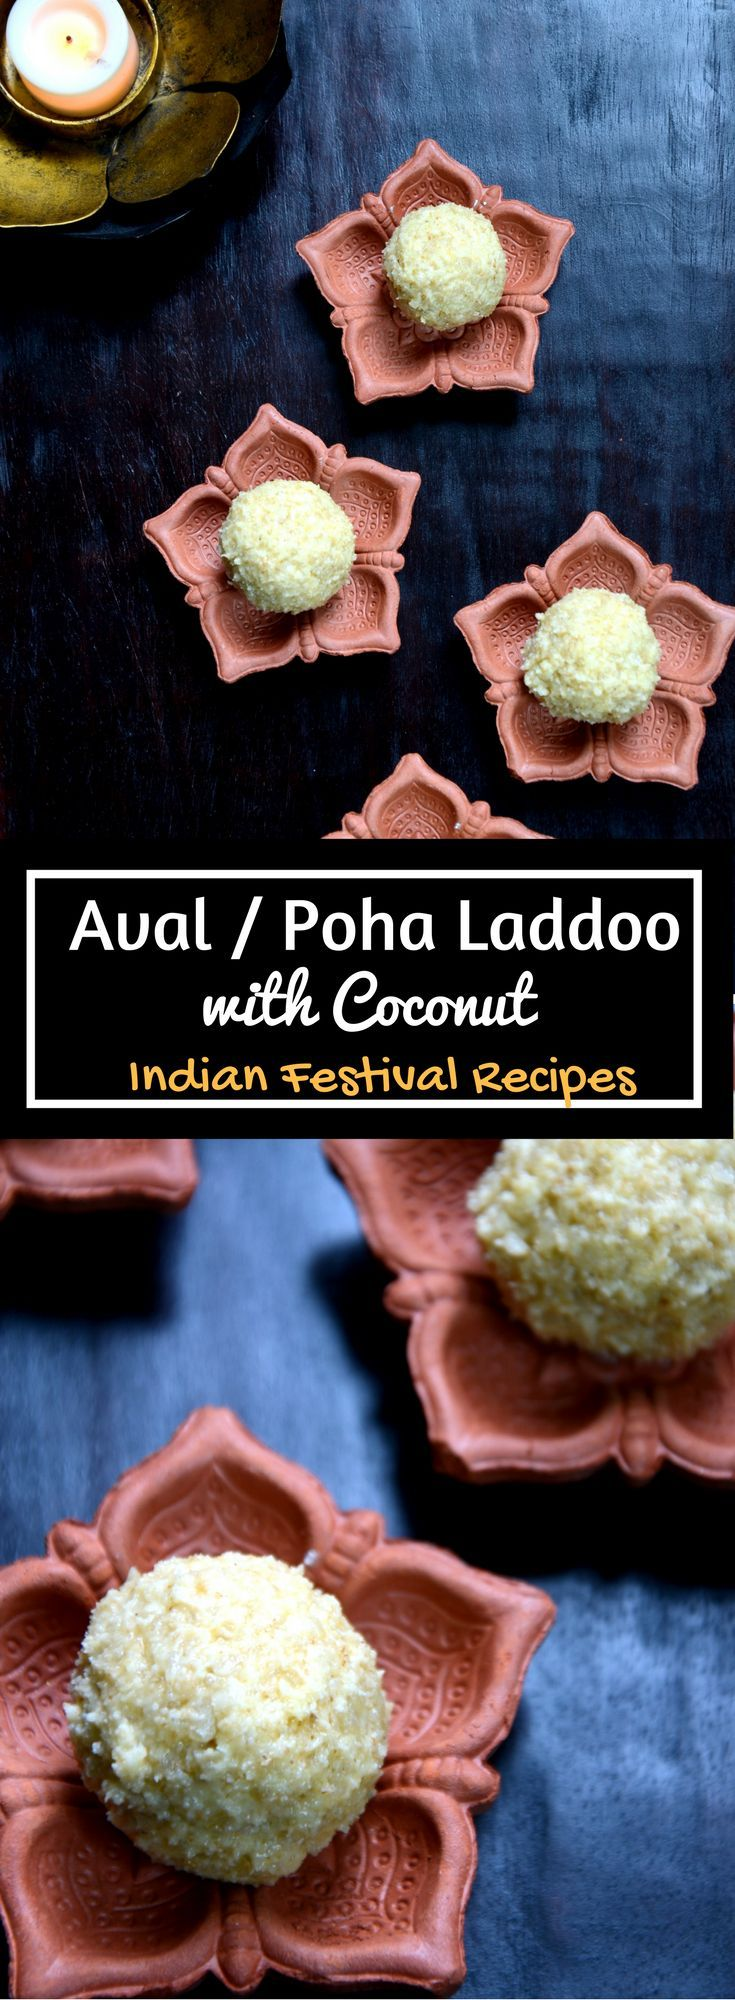 Aval laddoo poha laddoo with coconut diwali recipe recipes and aval laddoo poha laddoo with coconut diwali recipe forumfinder Gallery